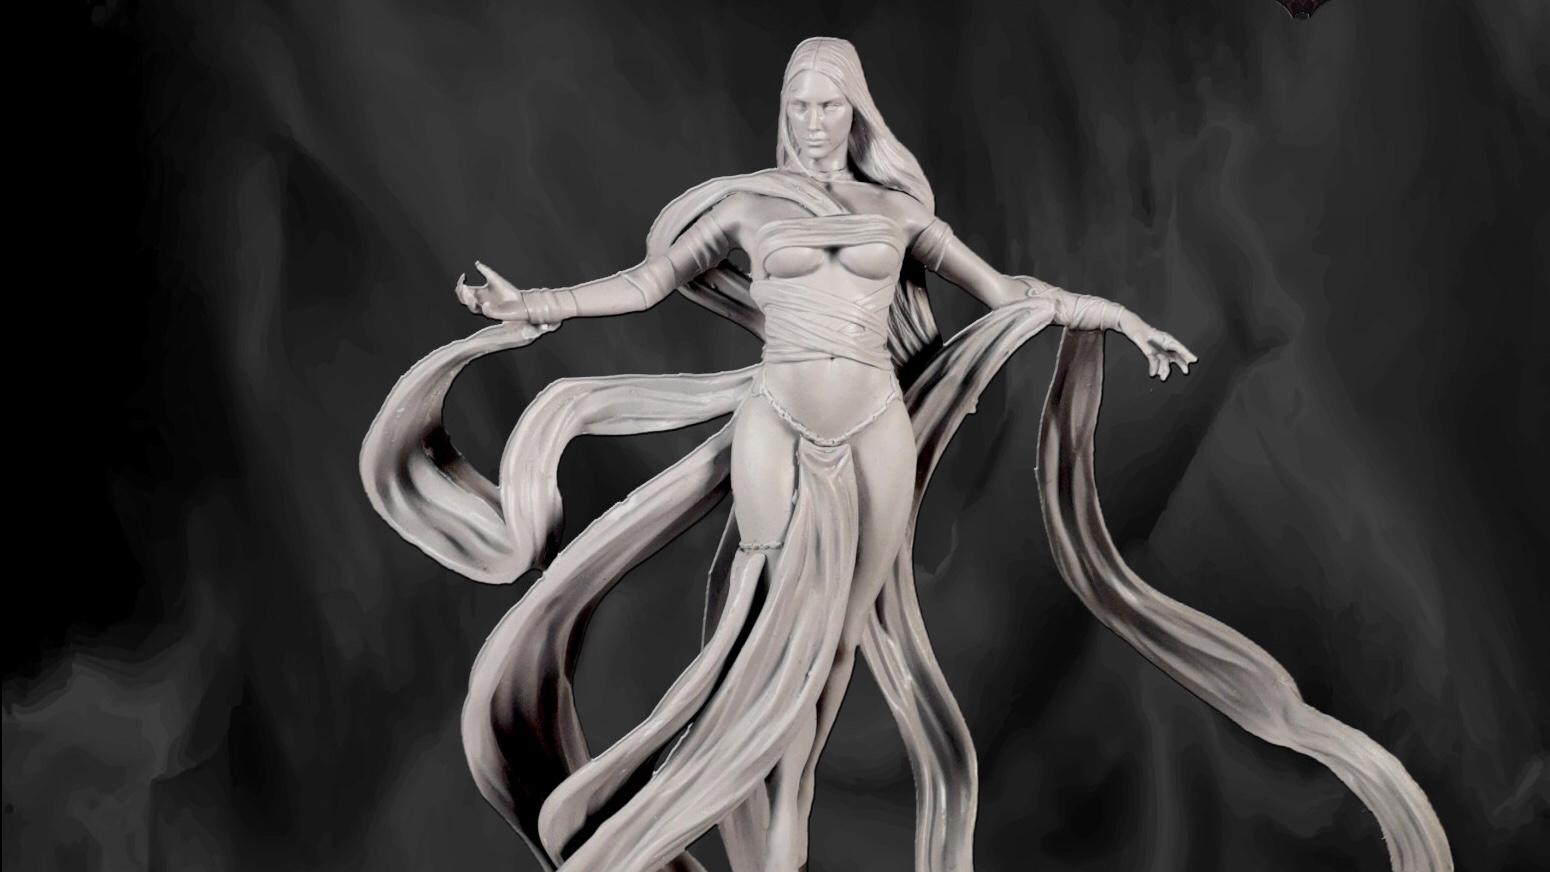 Cerberus Studios introduces new 'Goddess' Miniature